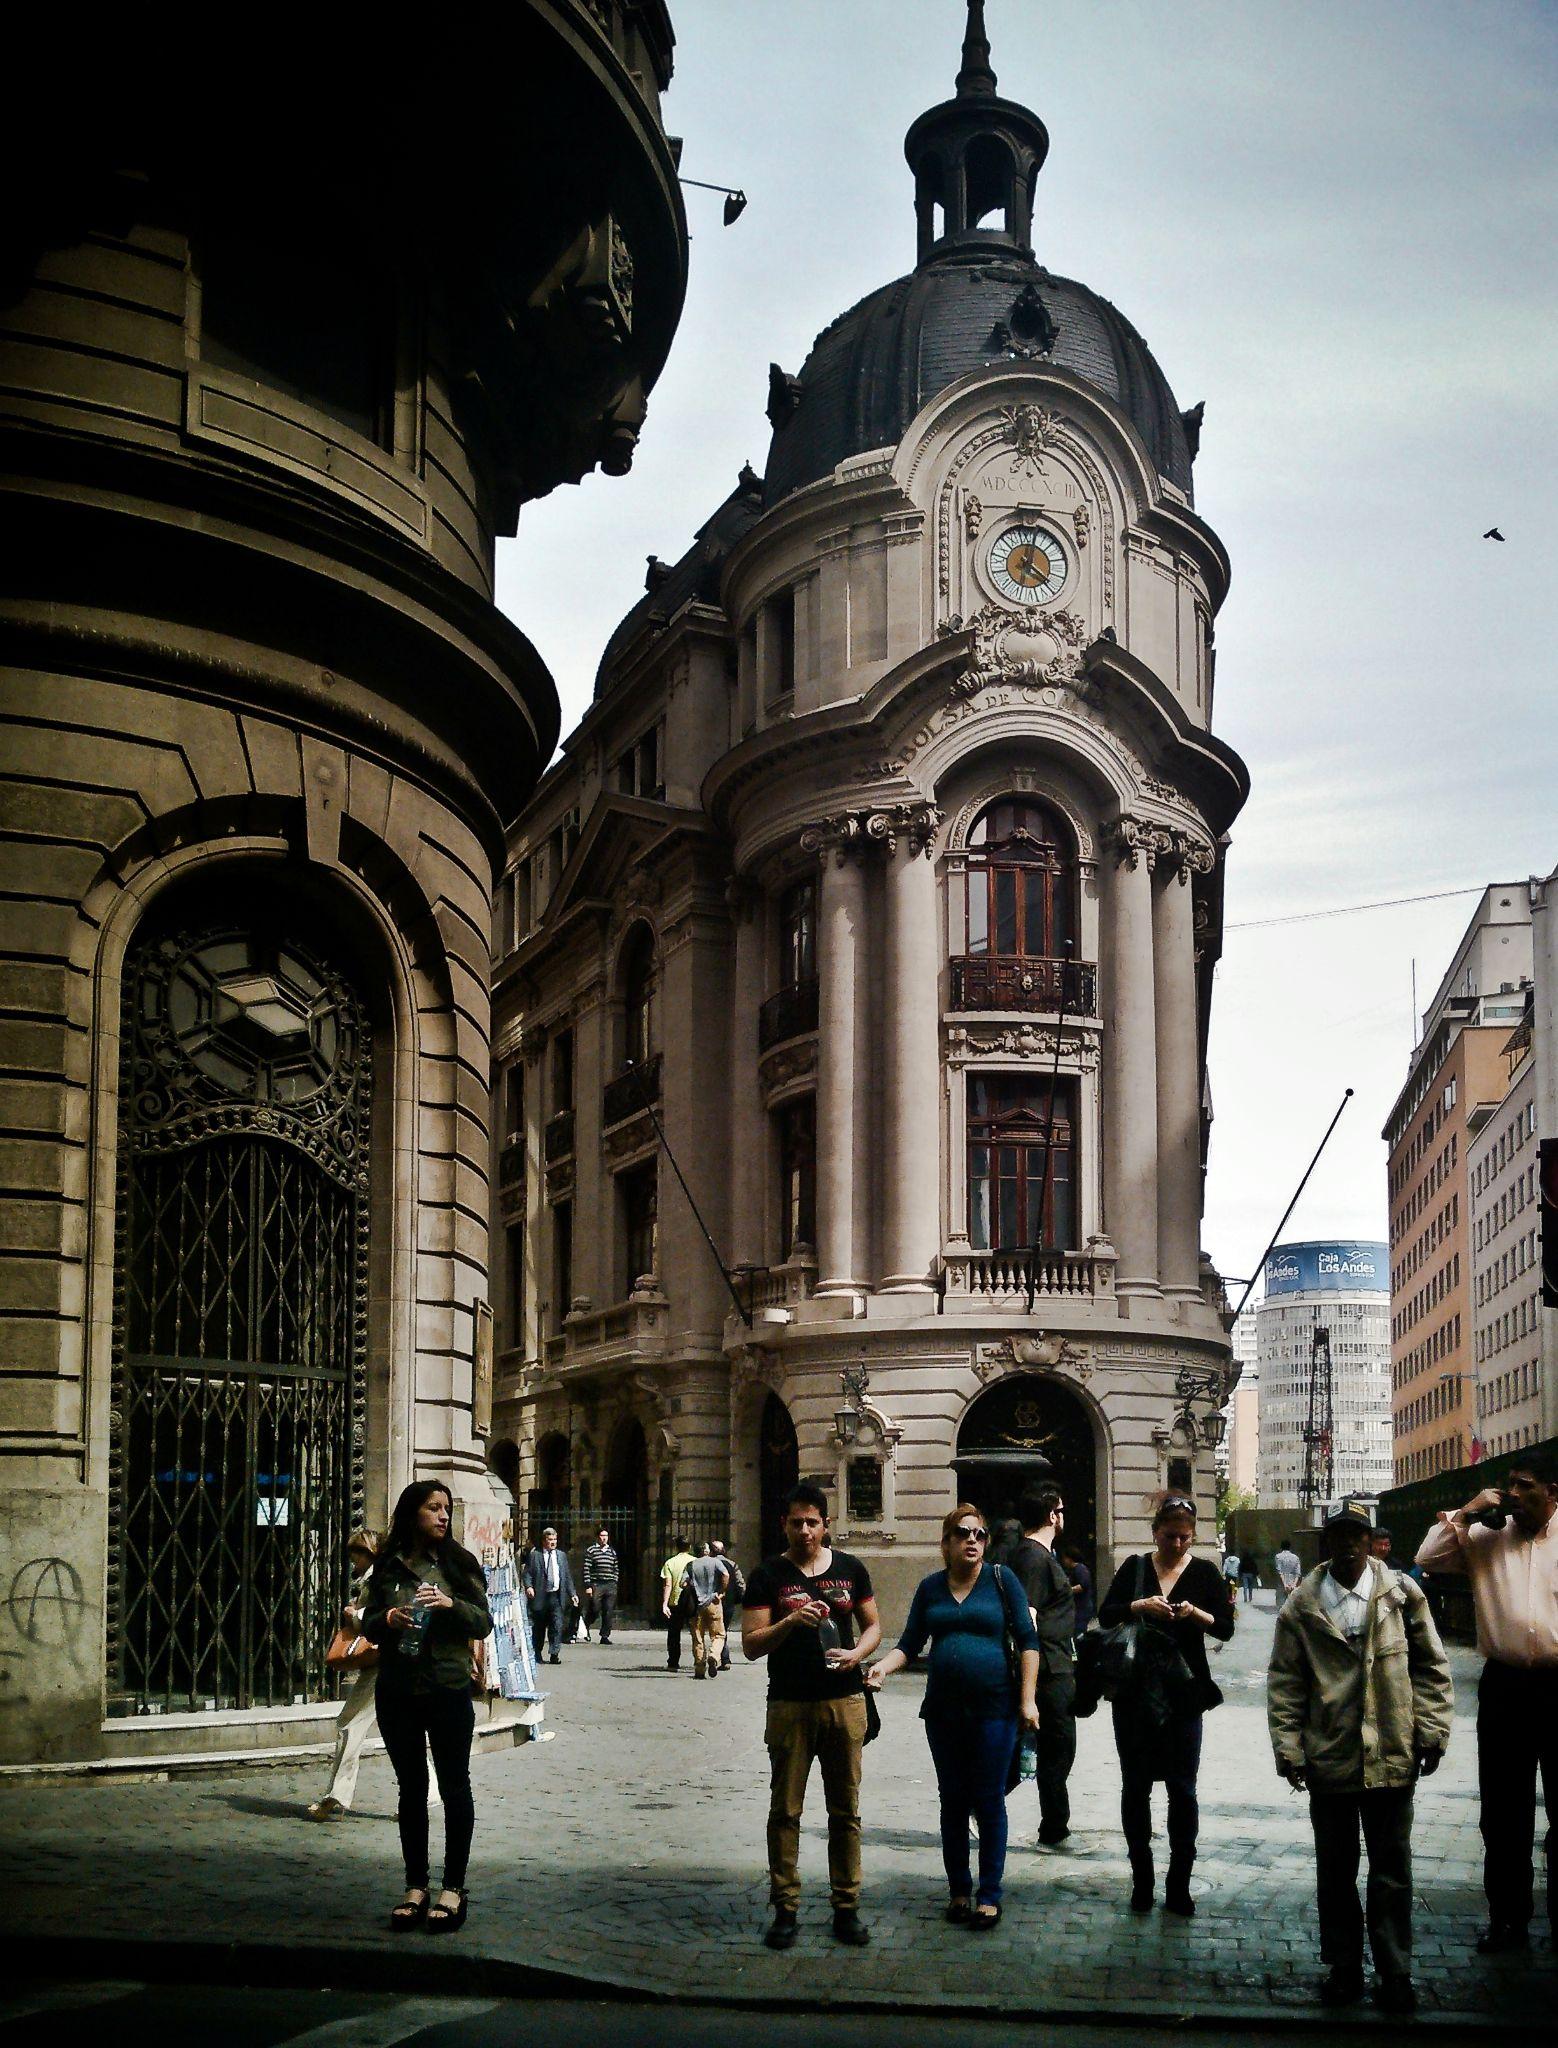 urban by ALEX PEDRAZA C